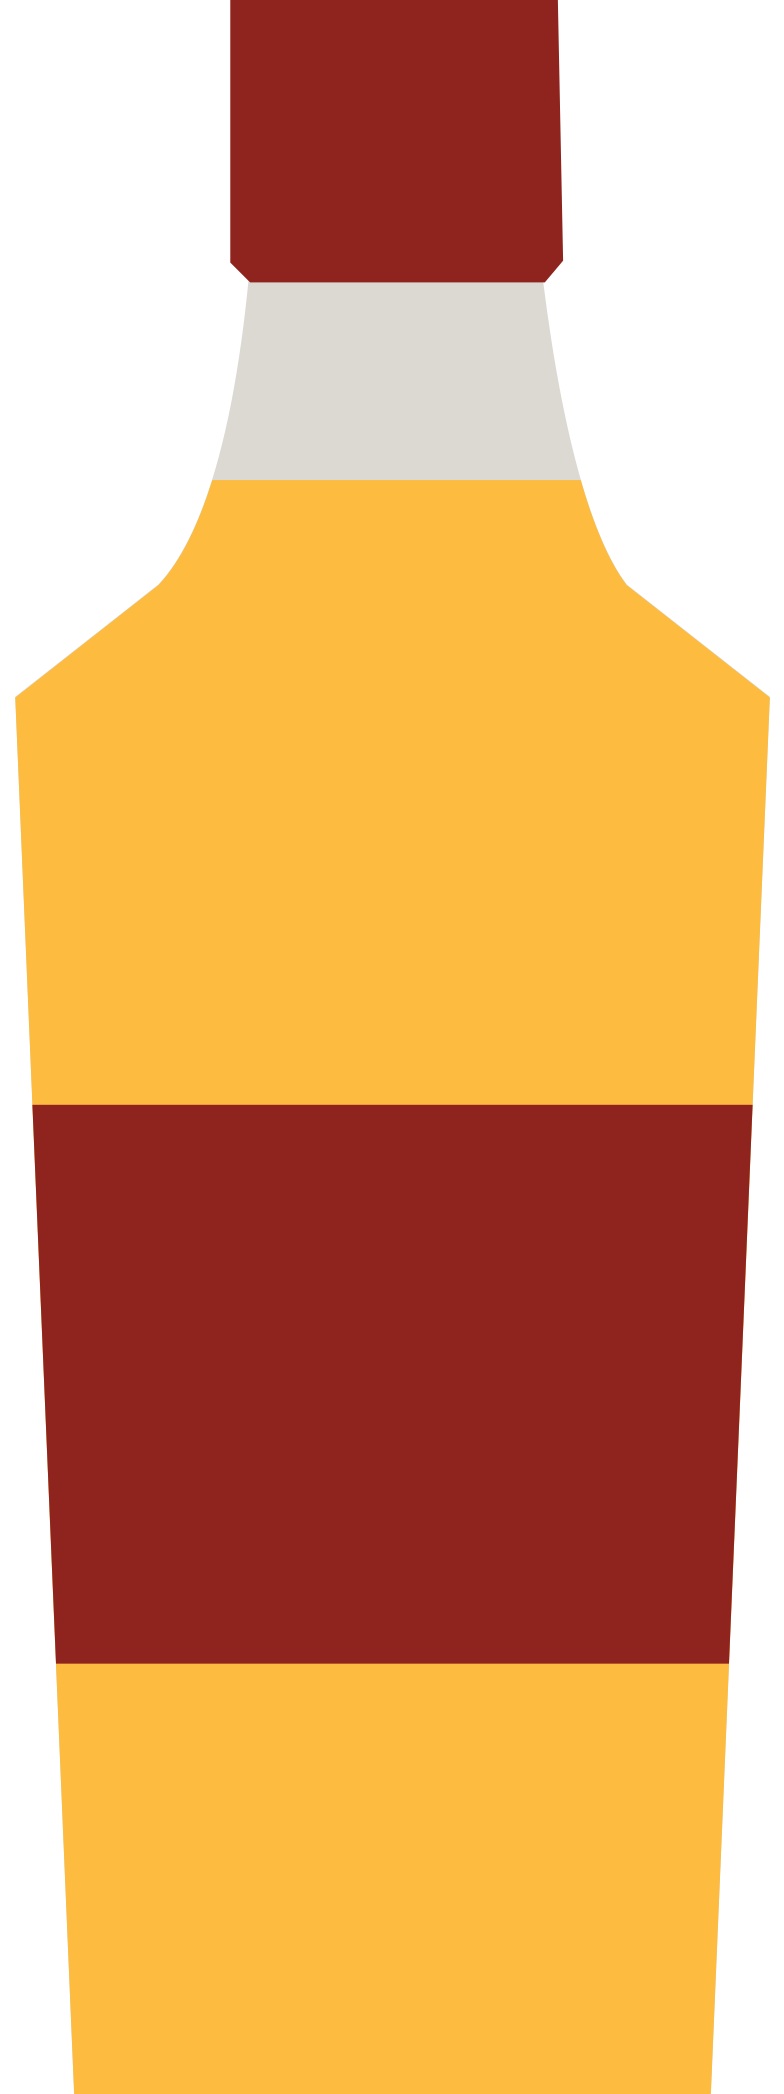 whisky Clipart illustration in PNG, SVG